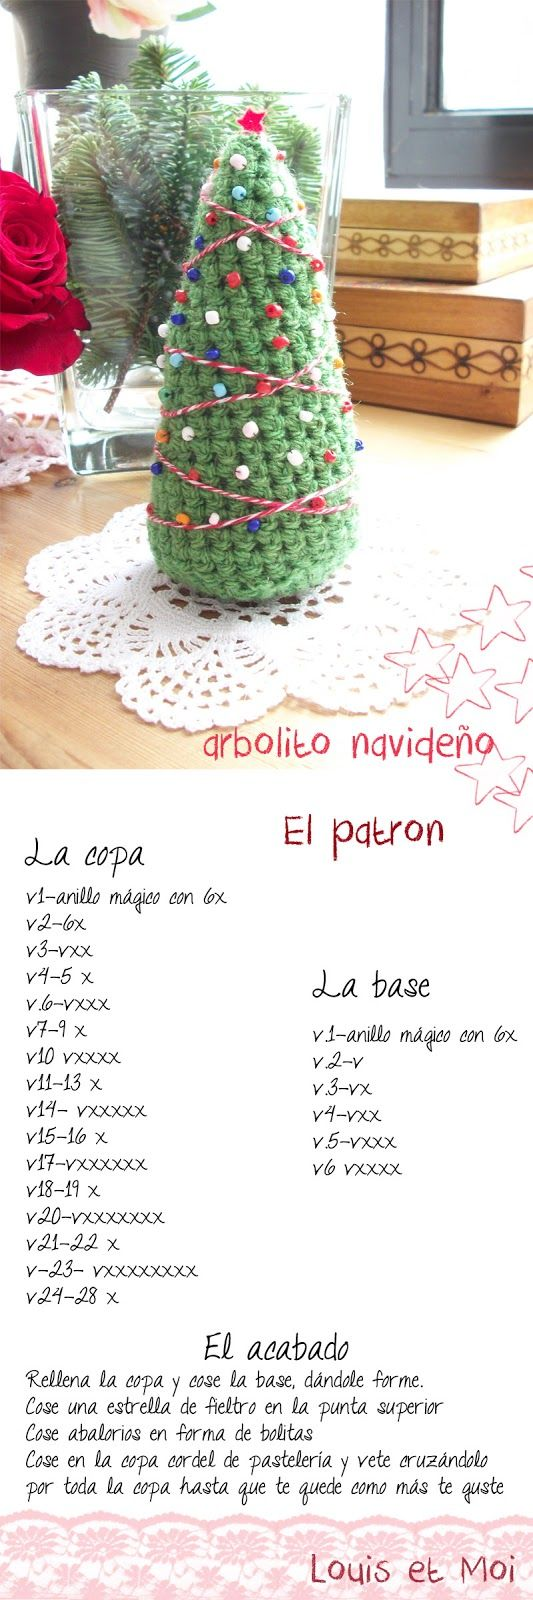 196 best NAVIDAD images on Pinterest | Holiday ornaments, Crochet ...